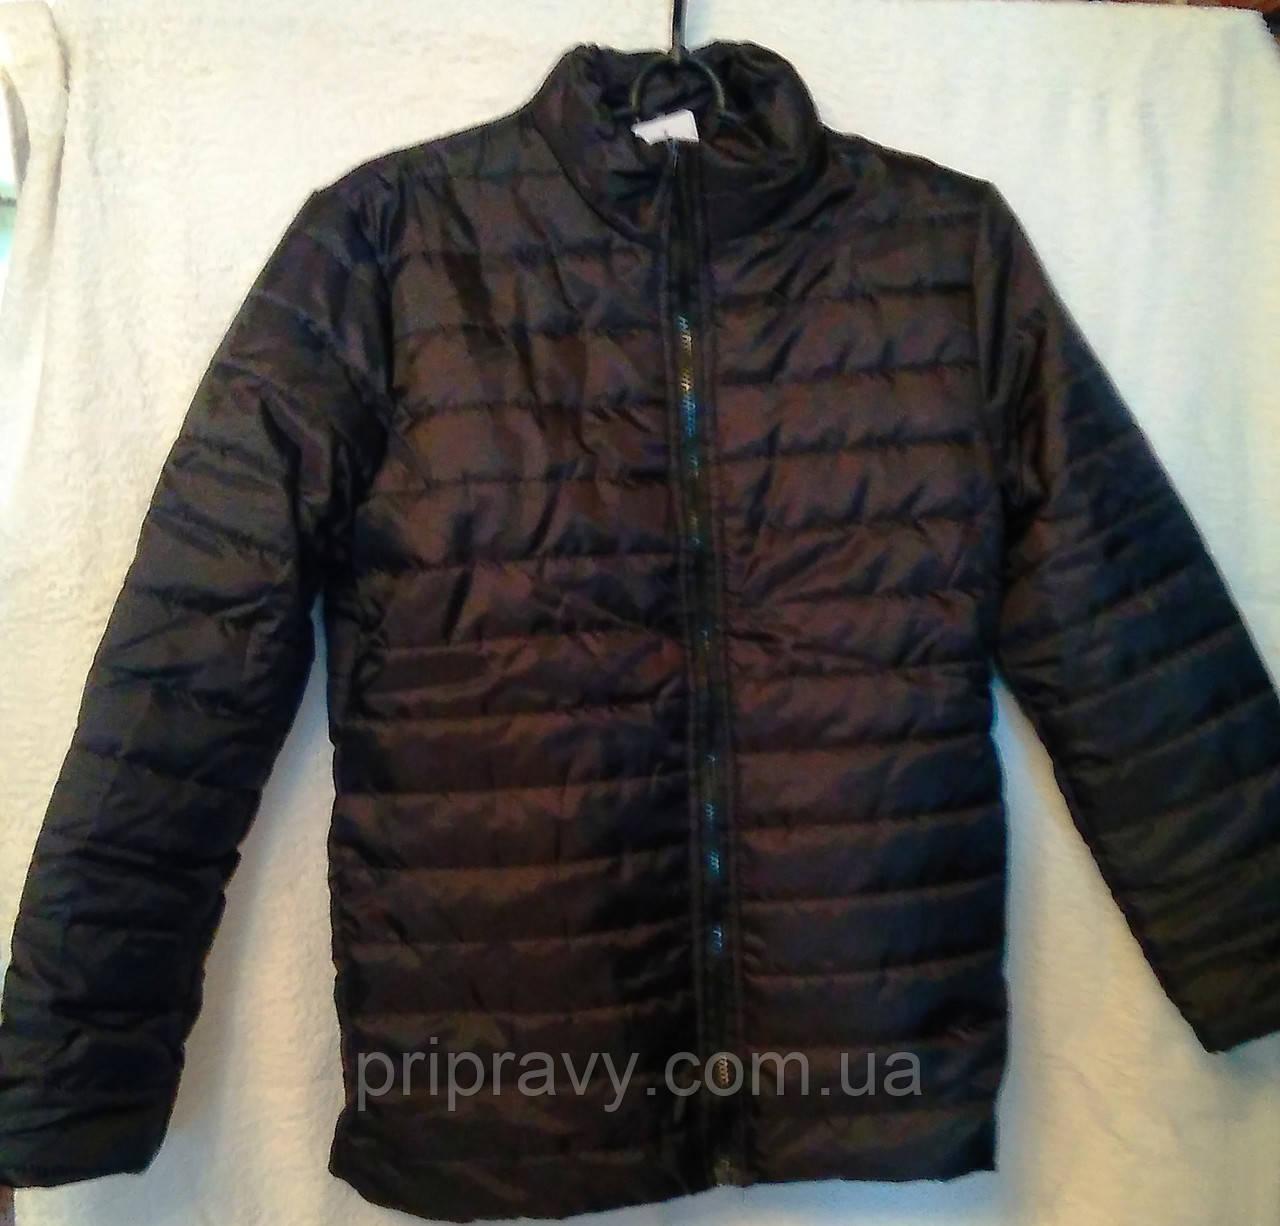 Куртка мужская на весну-осень, размер М